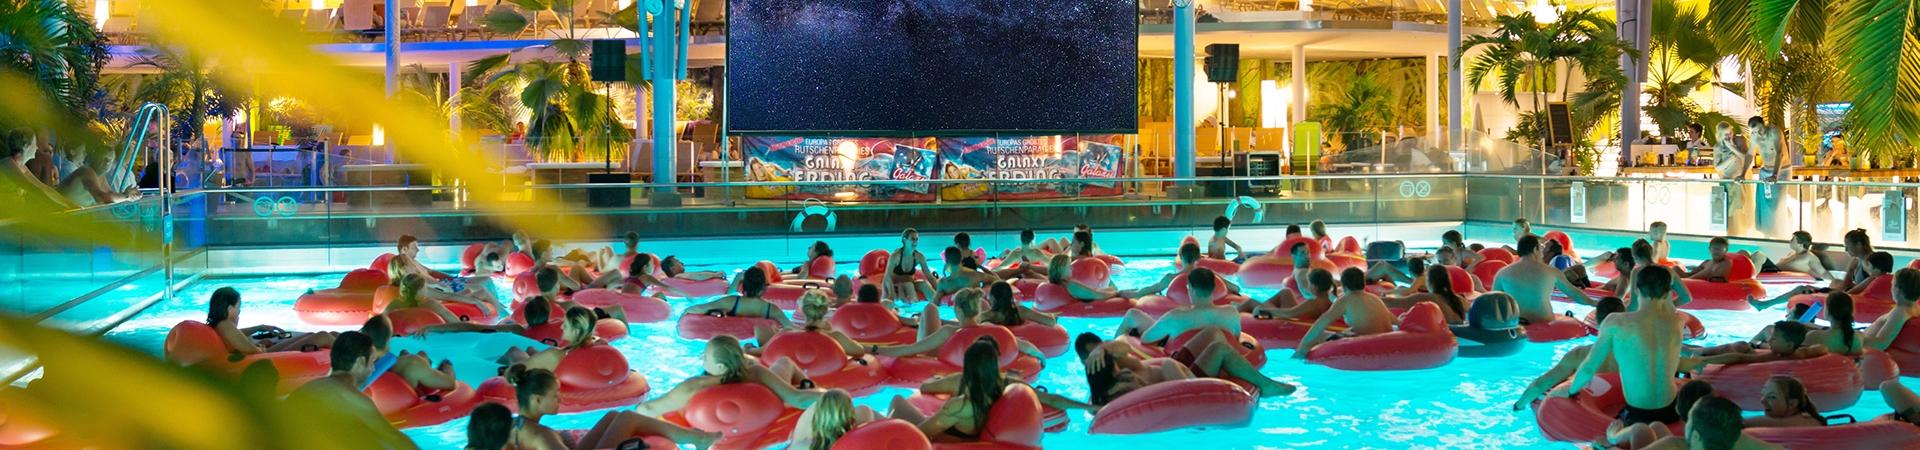 Silla de piscina inflable